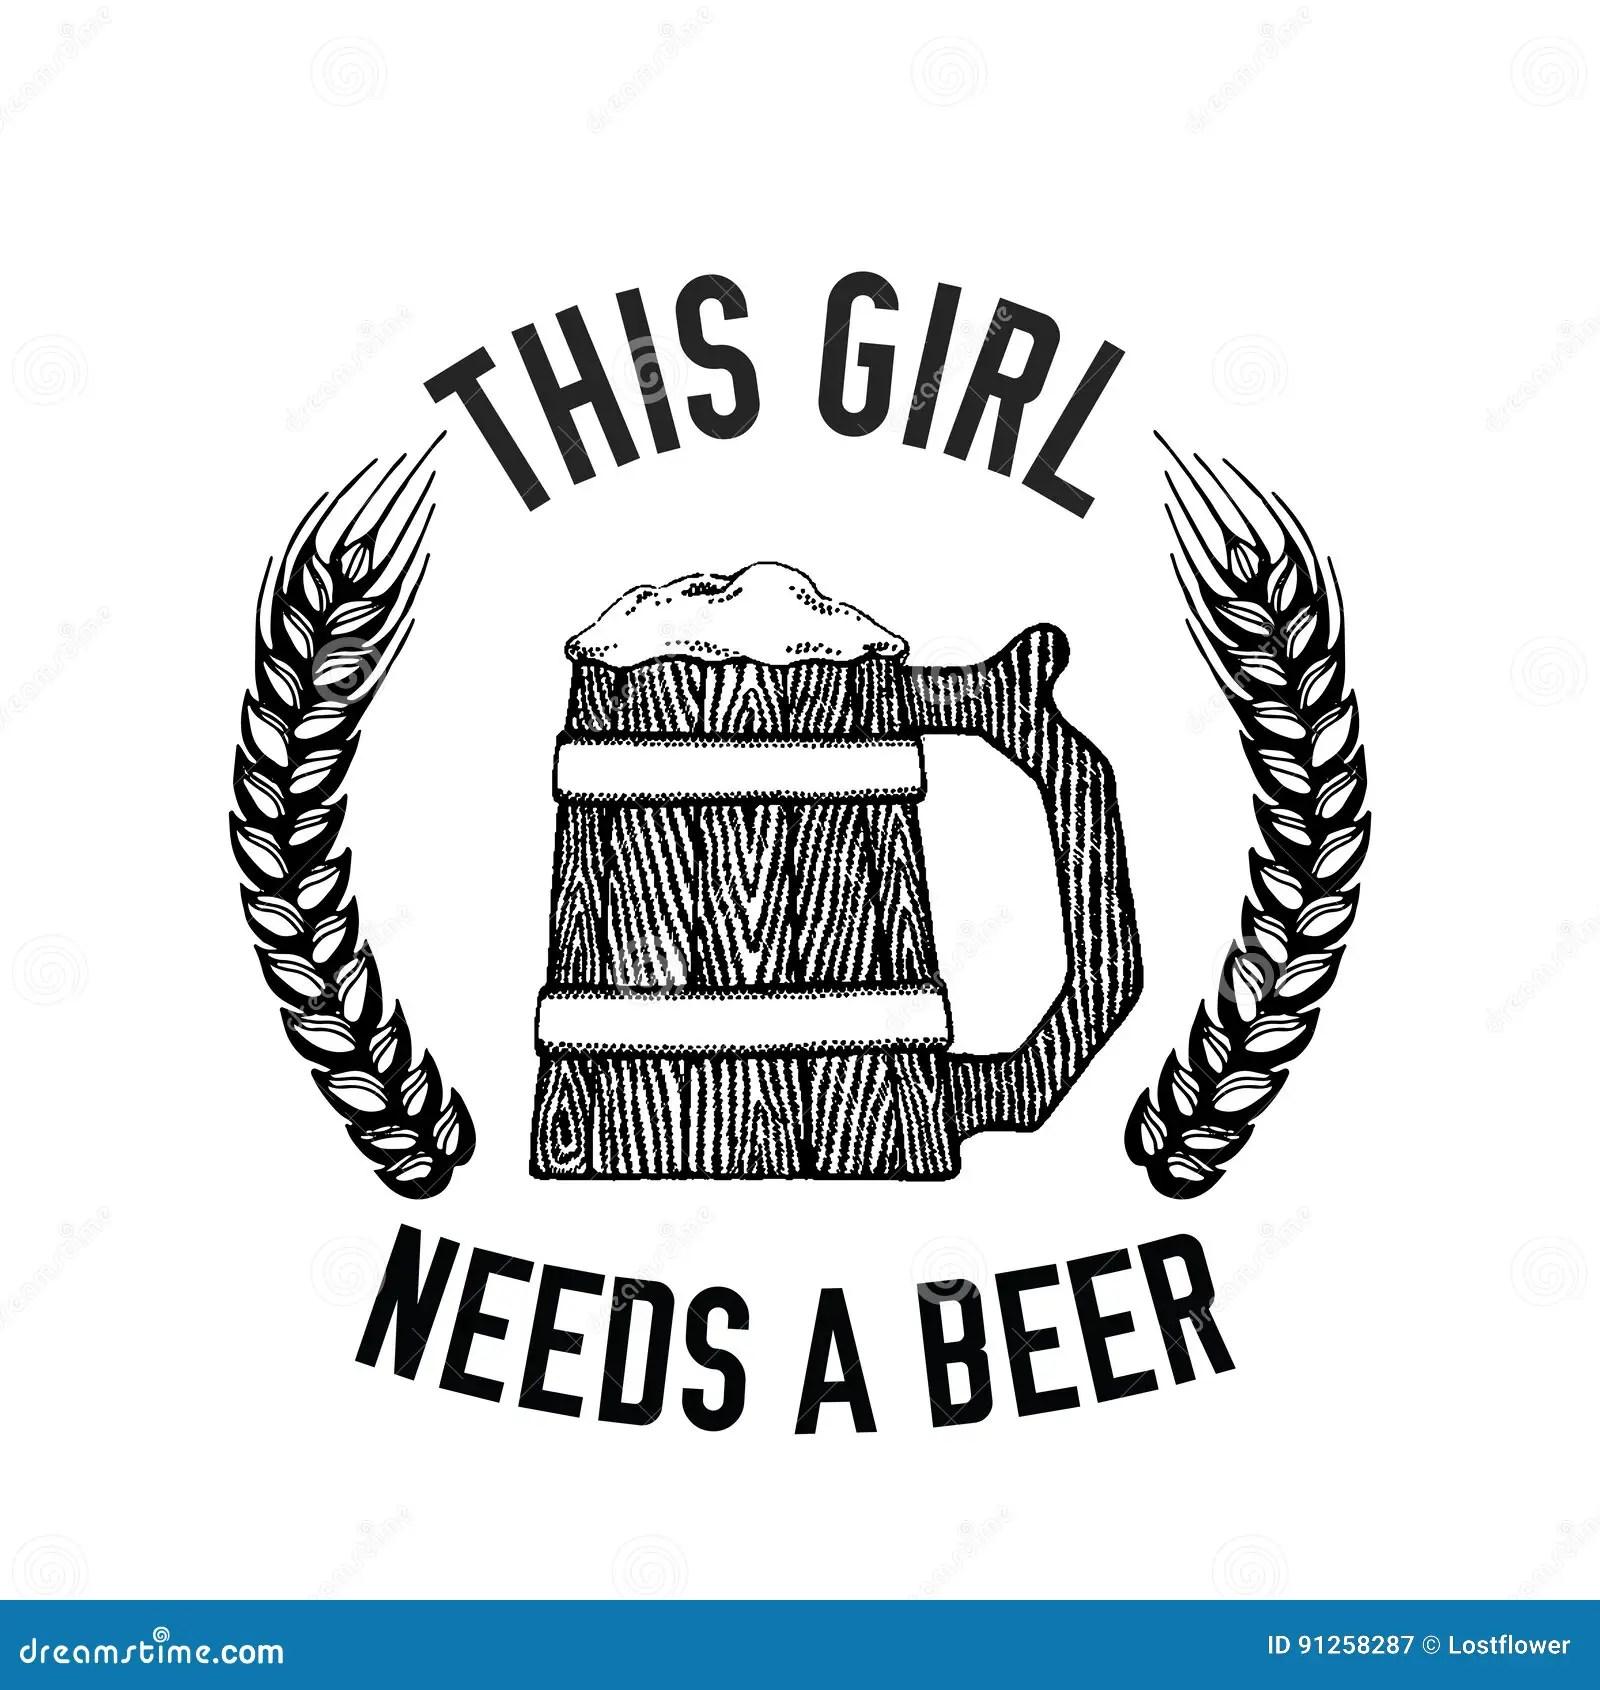 Imagen Dibujada Mano Del Vector De La Cita De La Cerveza